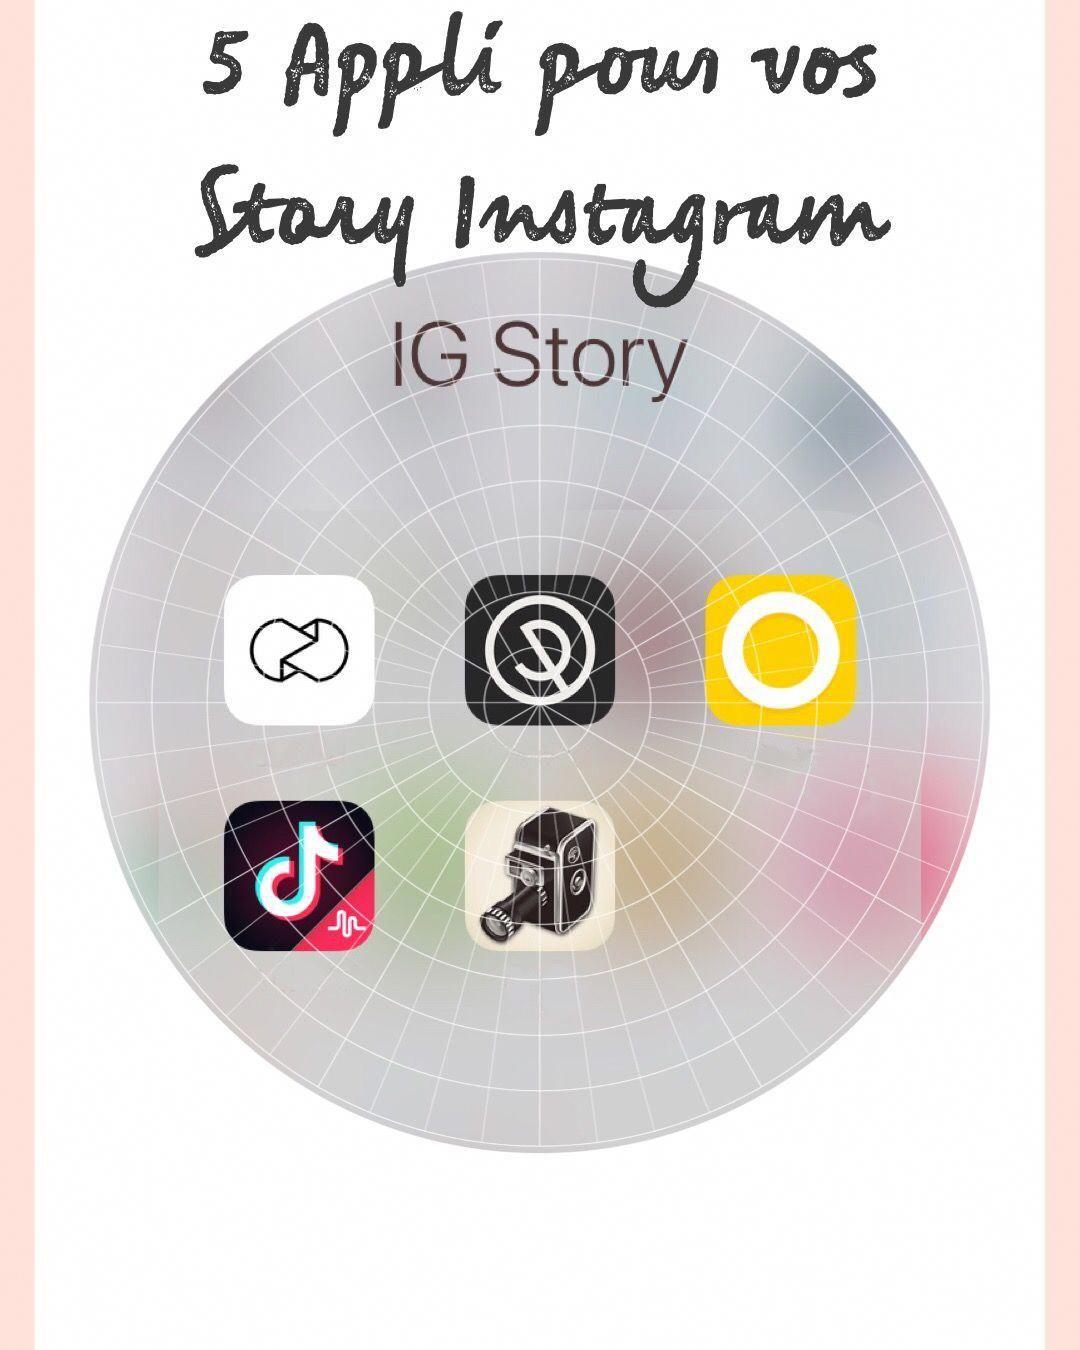 Appli Instagram Instagram App Application Instagram Retro Vintage Photo Video Editing Collage Photo A Vintage Photo Editing Instagram Collage Vintage App